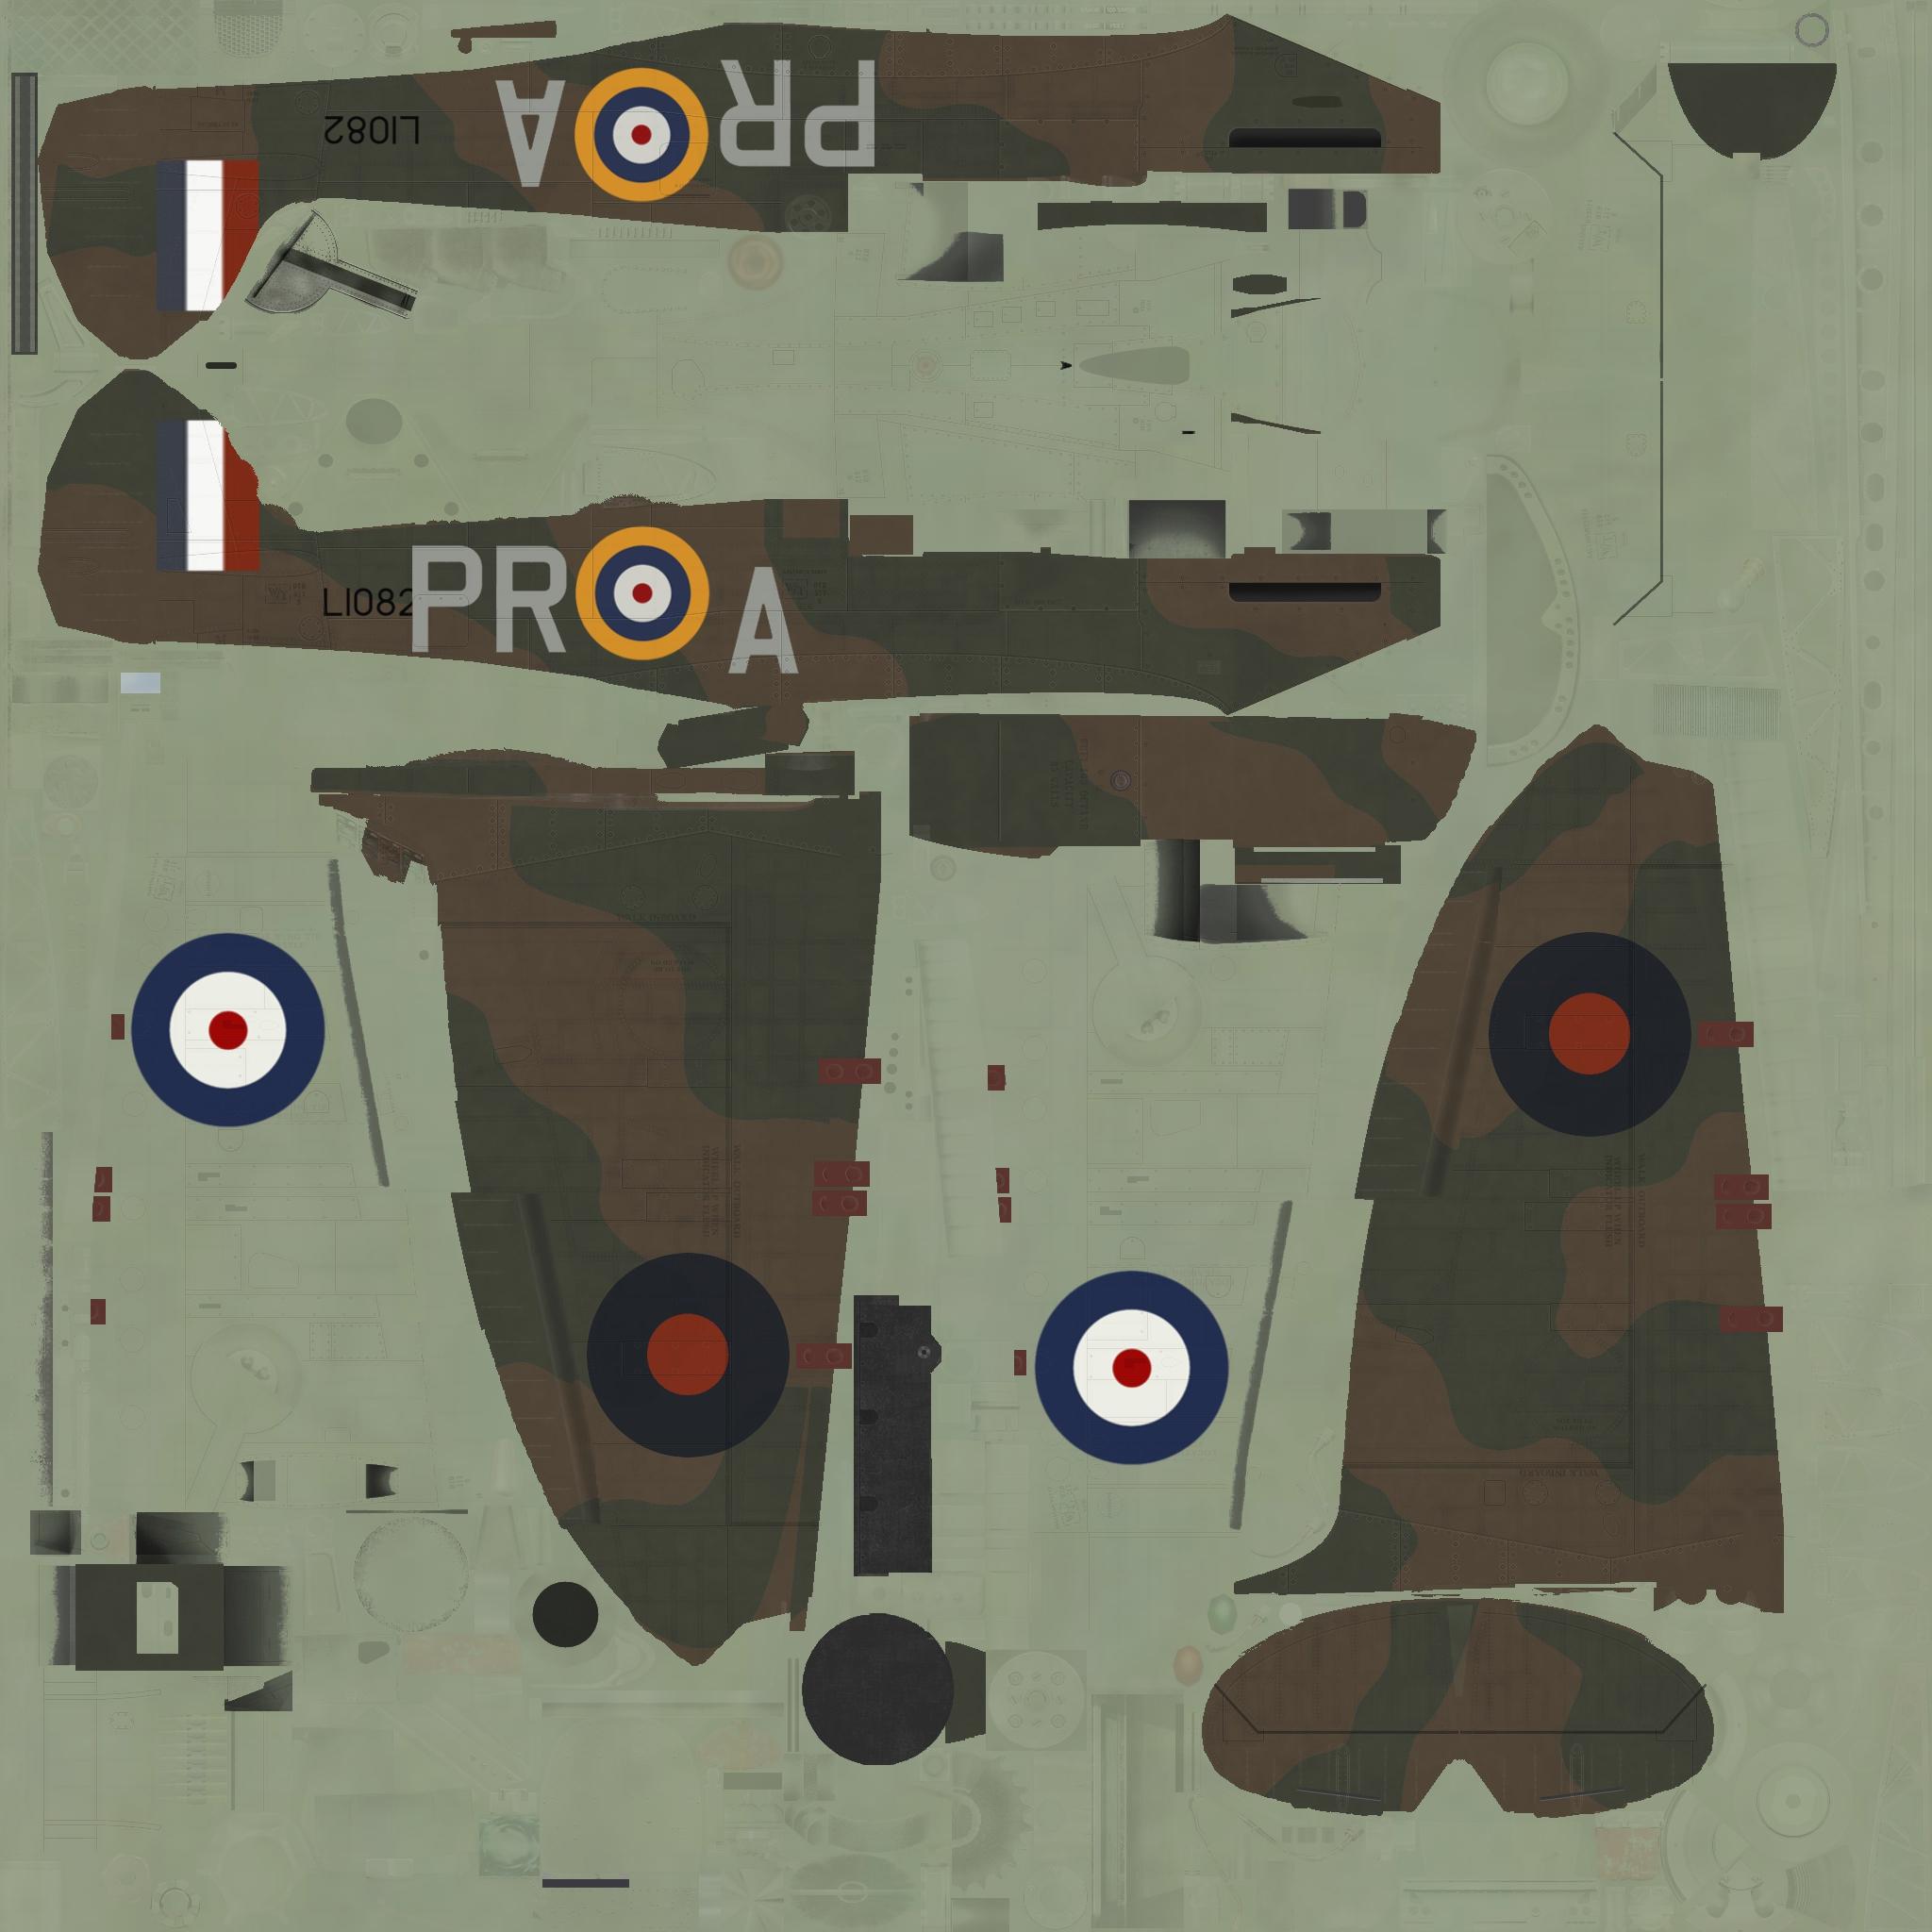 COD C6 MkI RAF 609Sqn PRA Tadeusz S Nowierski L1085 Middle Wallop 1940